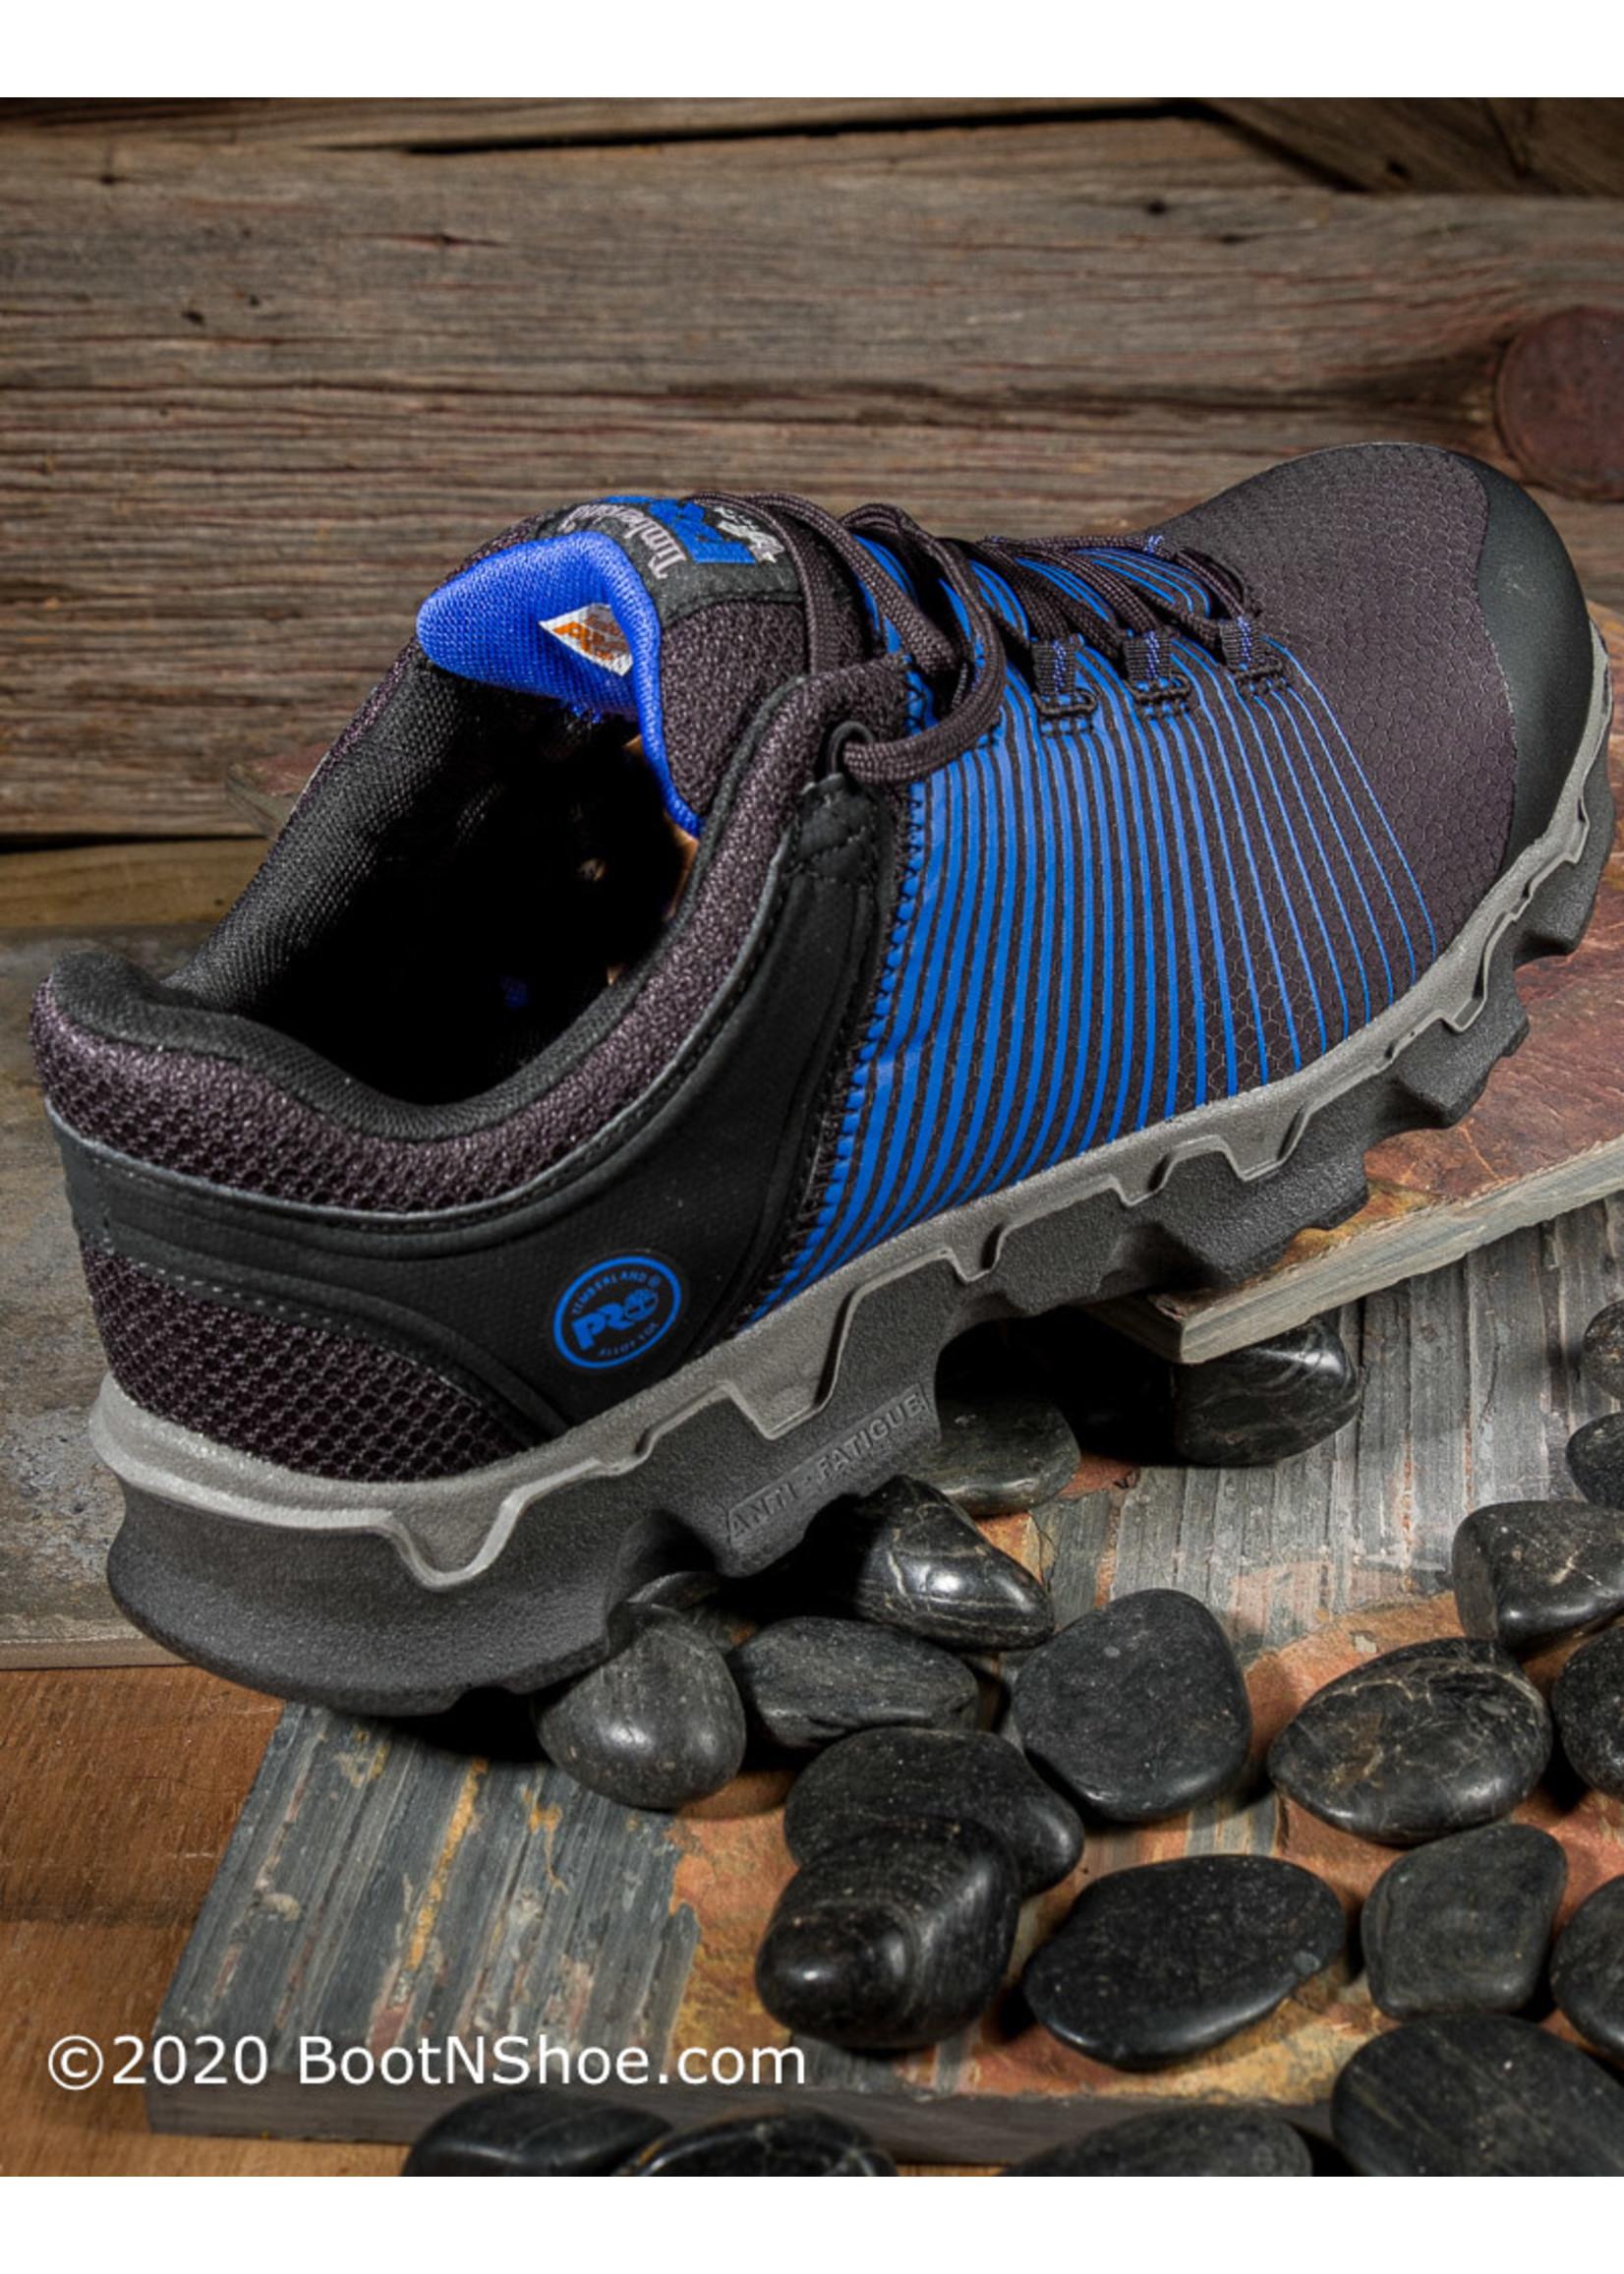 Timberland Pro Men's Powertrain Sport SD+ Alloy Toe Athletic Work Shoe A1VH4